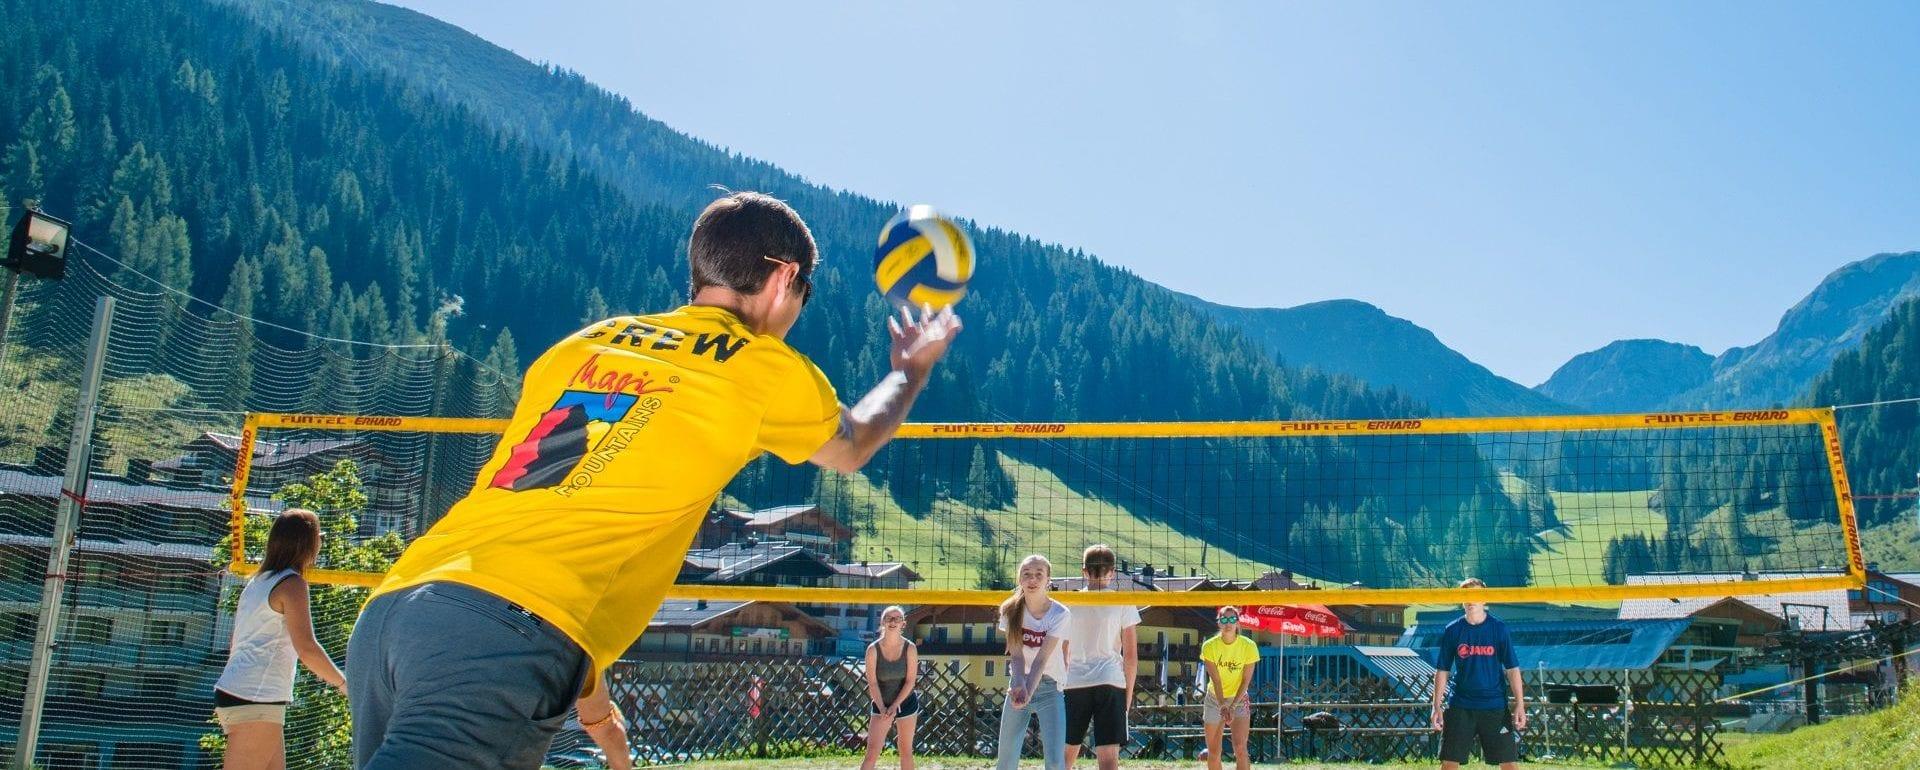 Magic Mountains Familienurlaub Berge Hotel Sportwelt